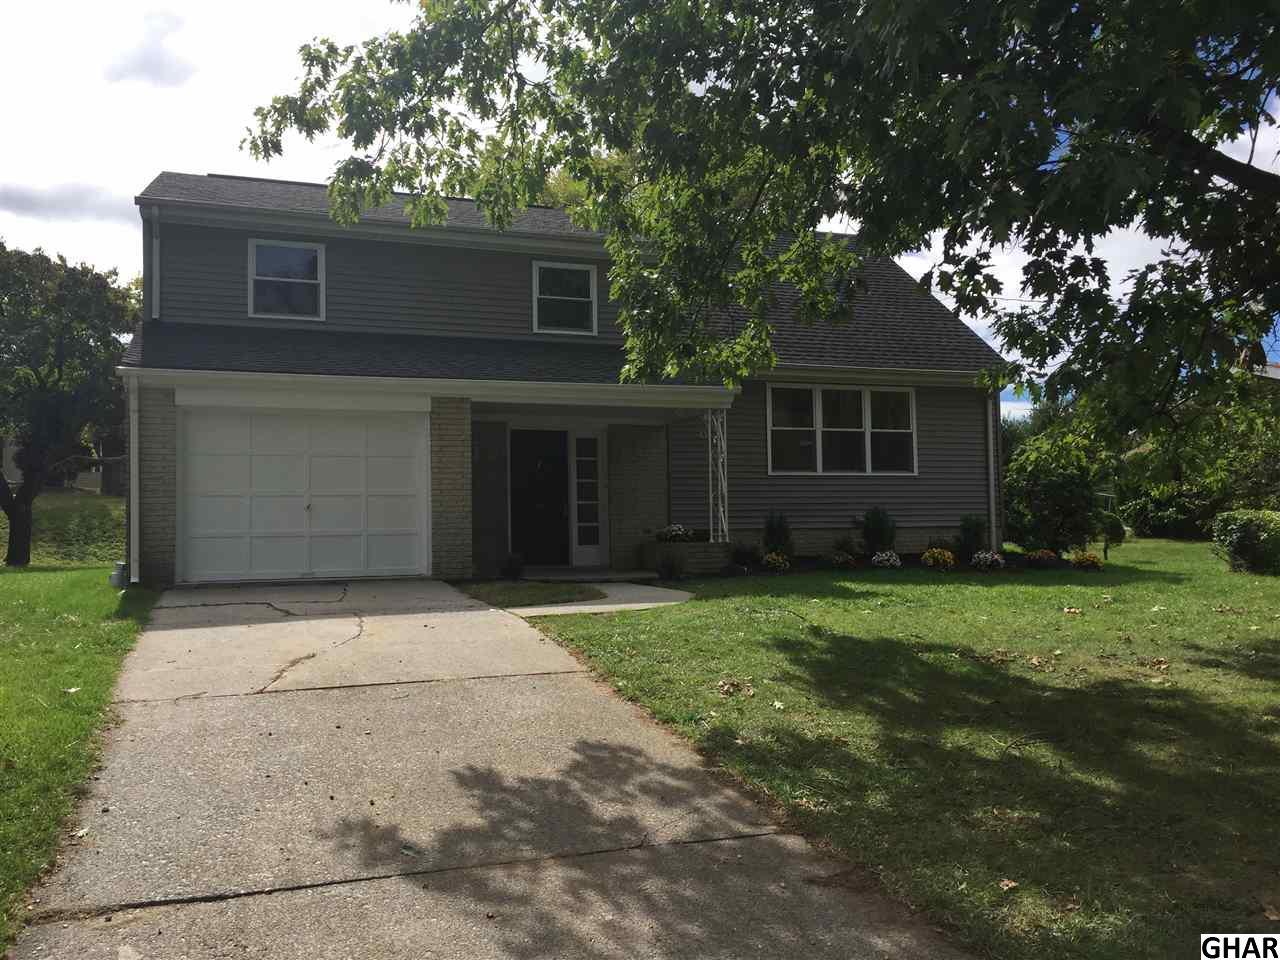 Real Estate for Sale, ListingId: 35728145, Harrisburg,PA17109